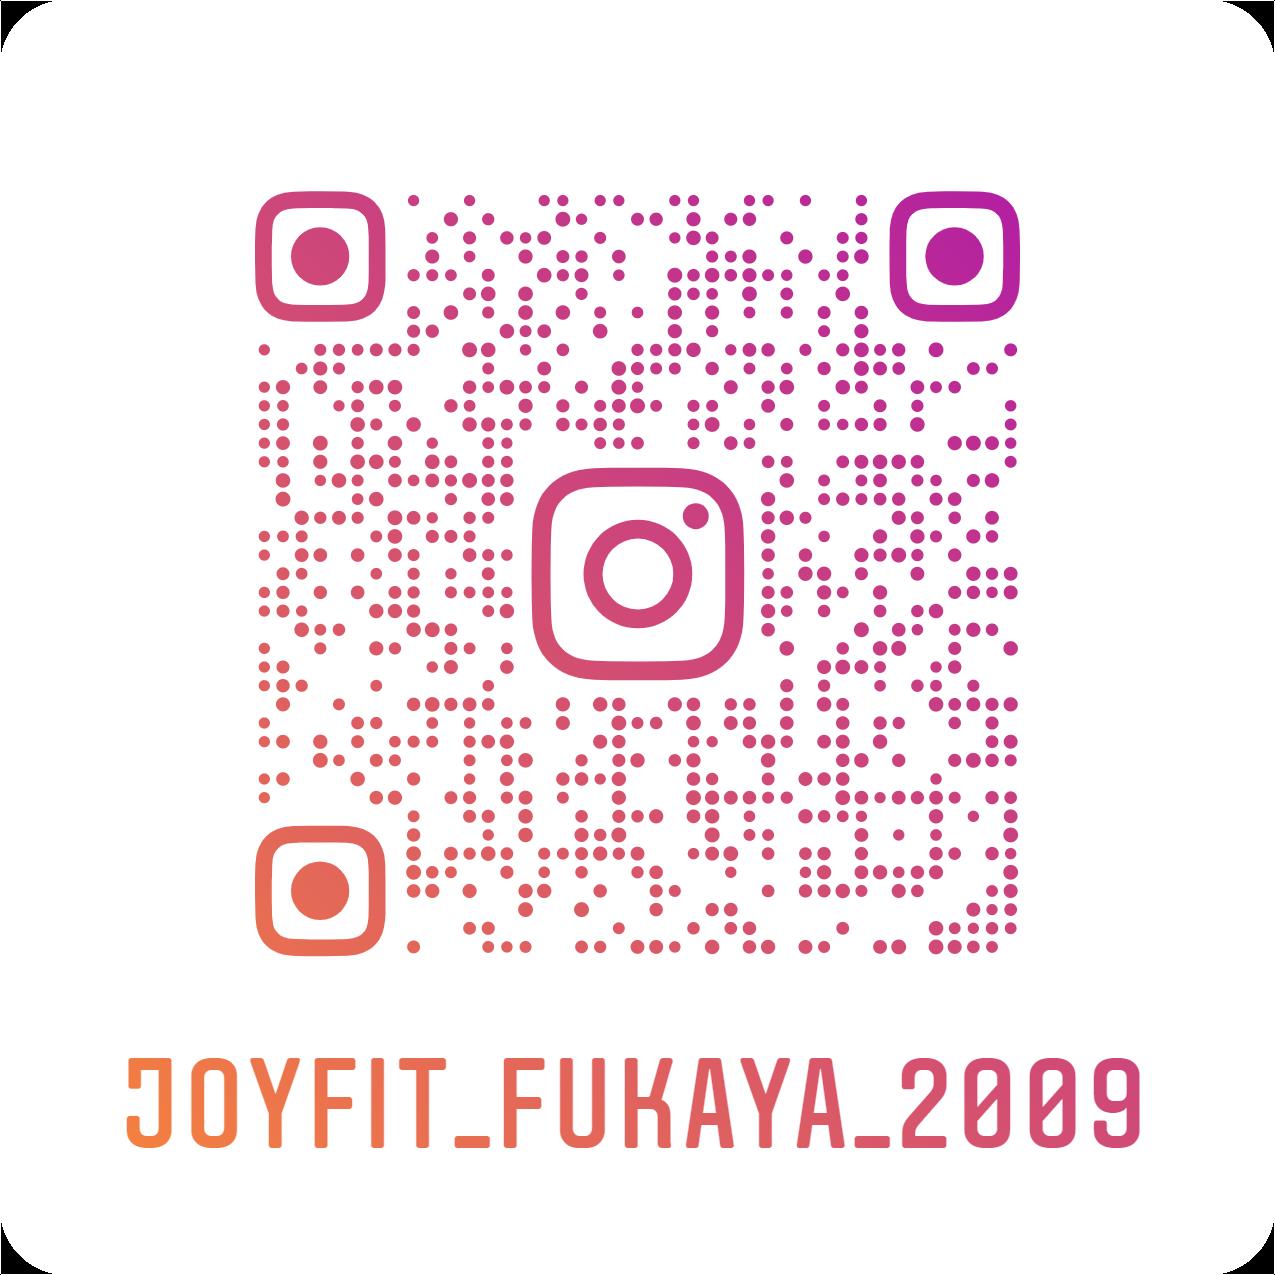 JOYFIT深谷 Instagram